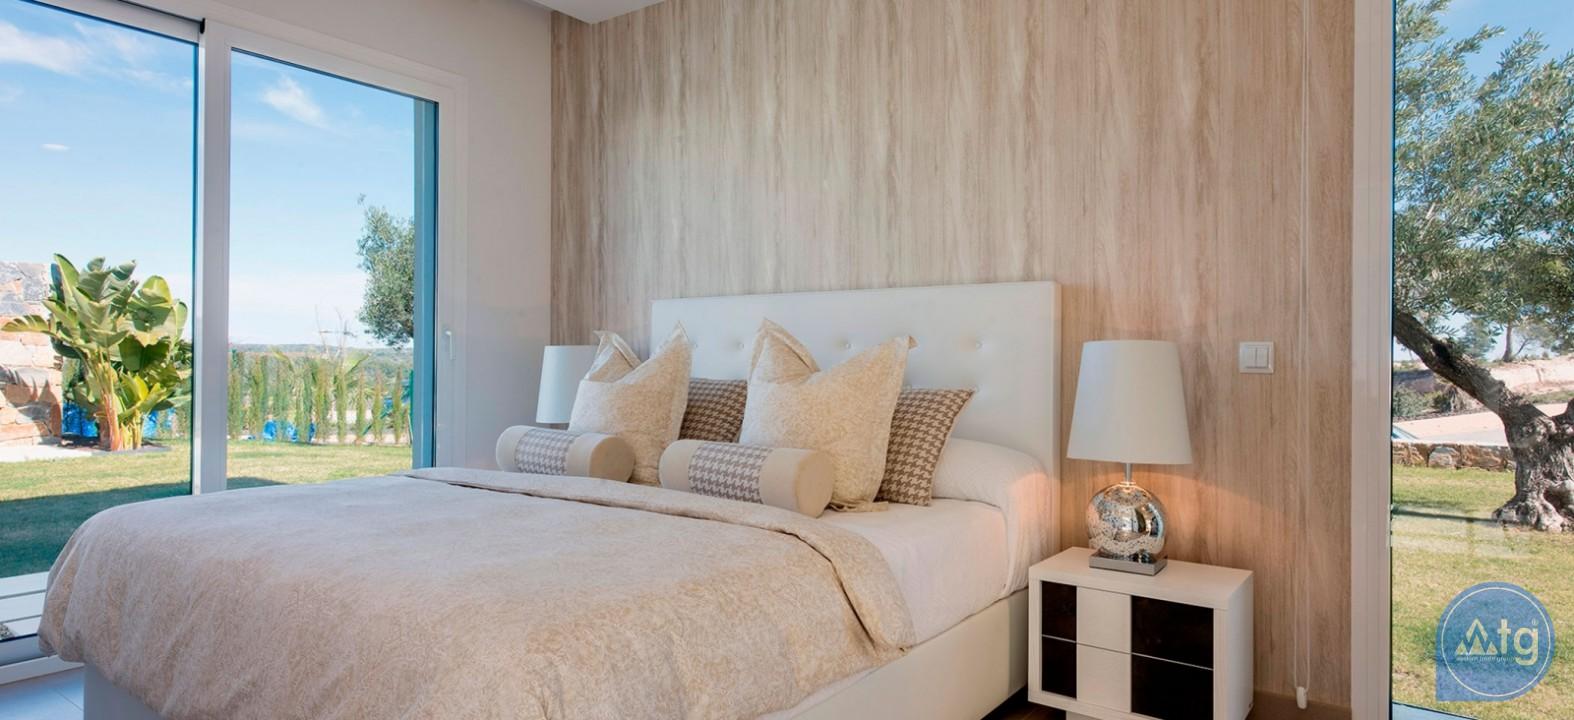 Bungalow de 3 chambres à Pilar de la Horadada - SR2619 - 6